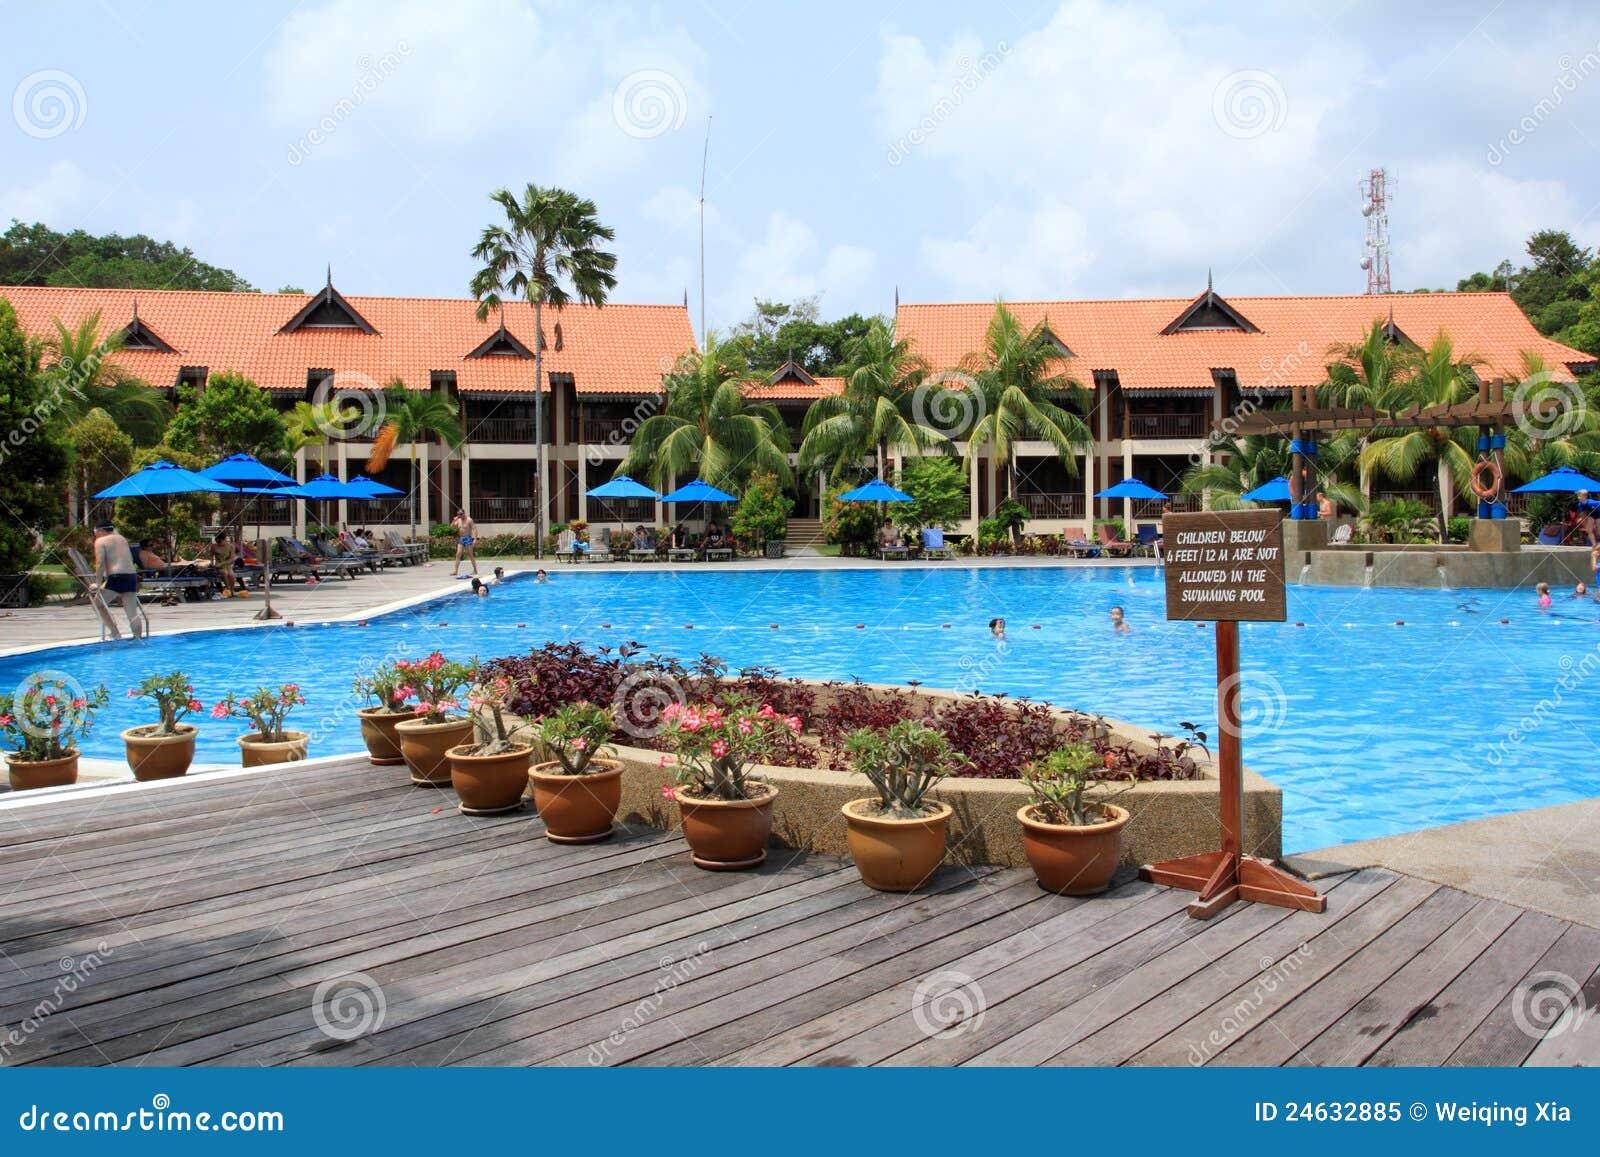 Swimmingpool in der Rücksortierung